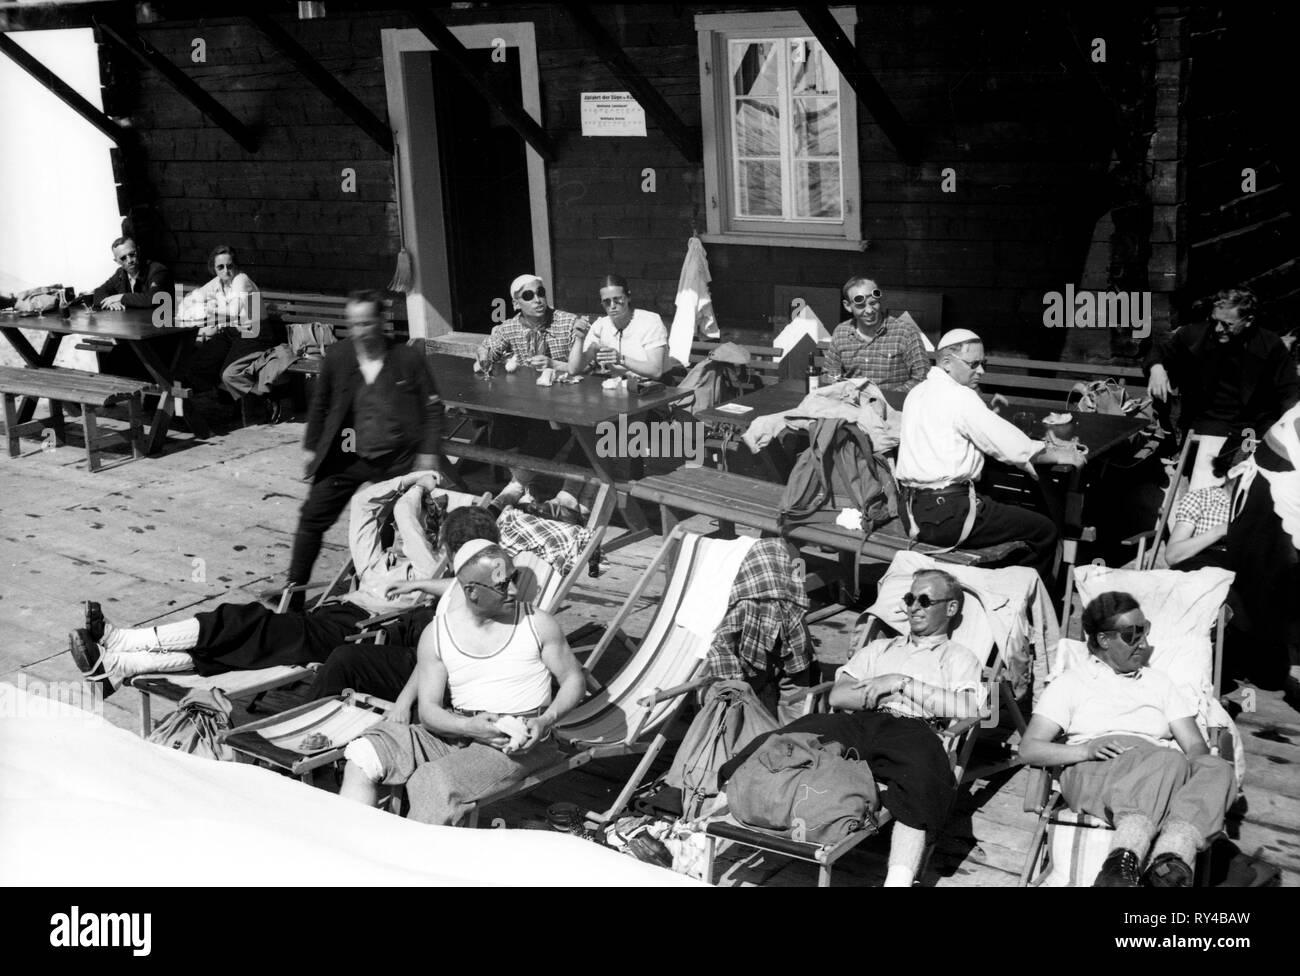 1937 in Switzerland